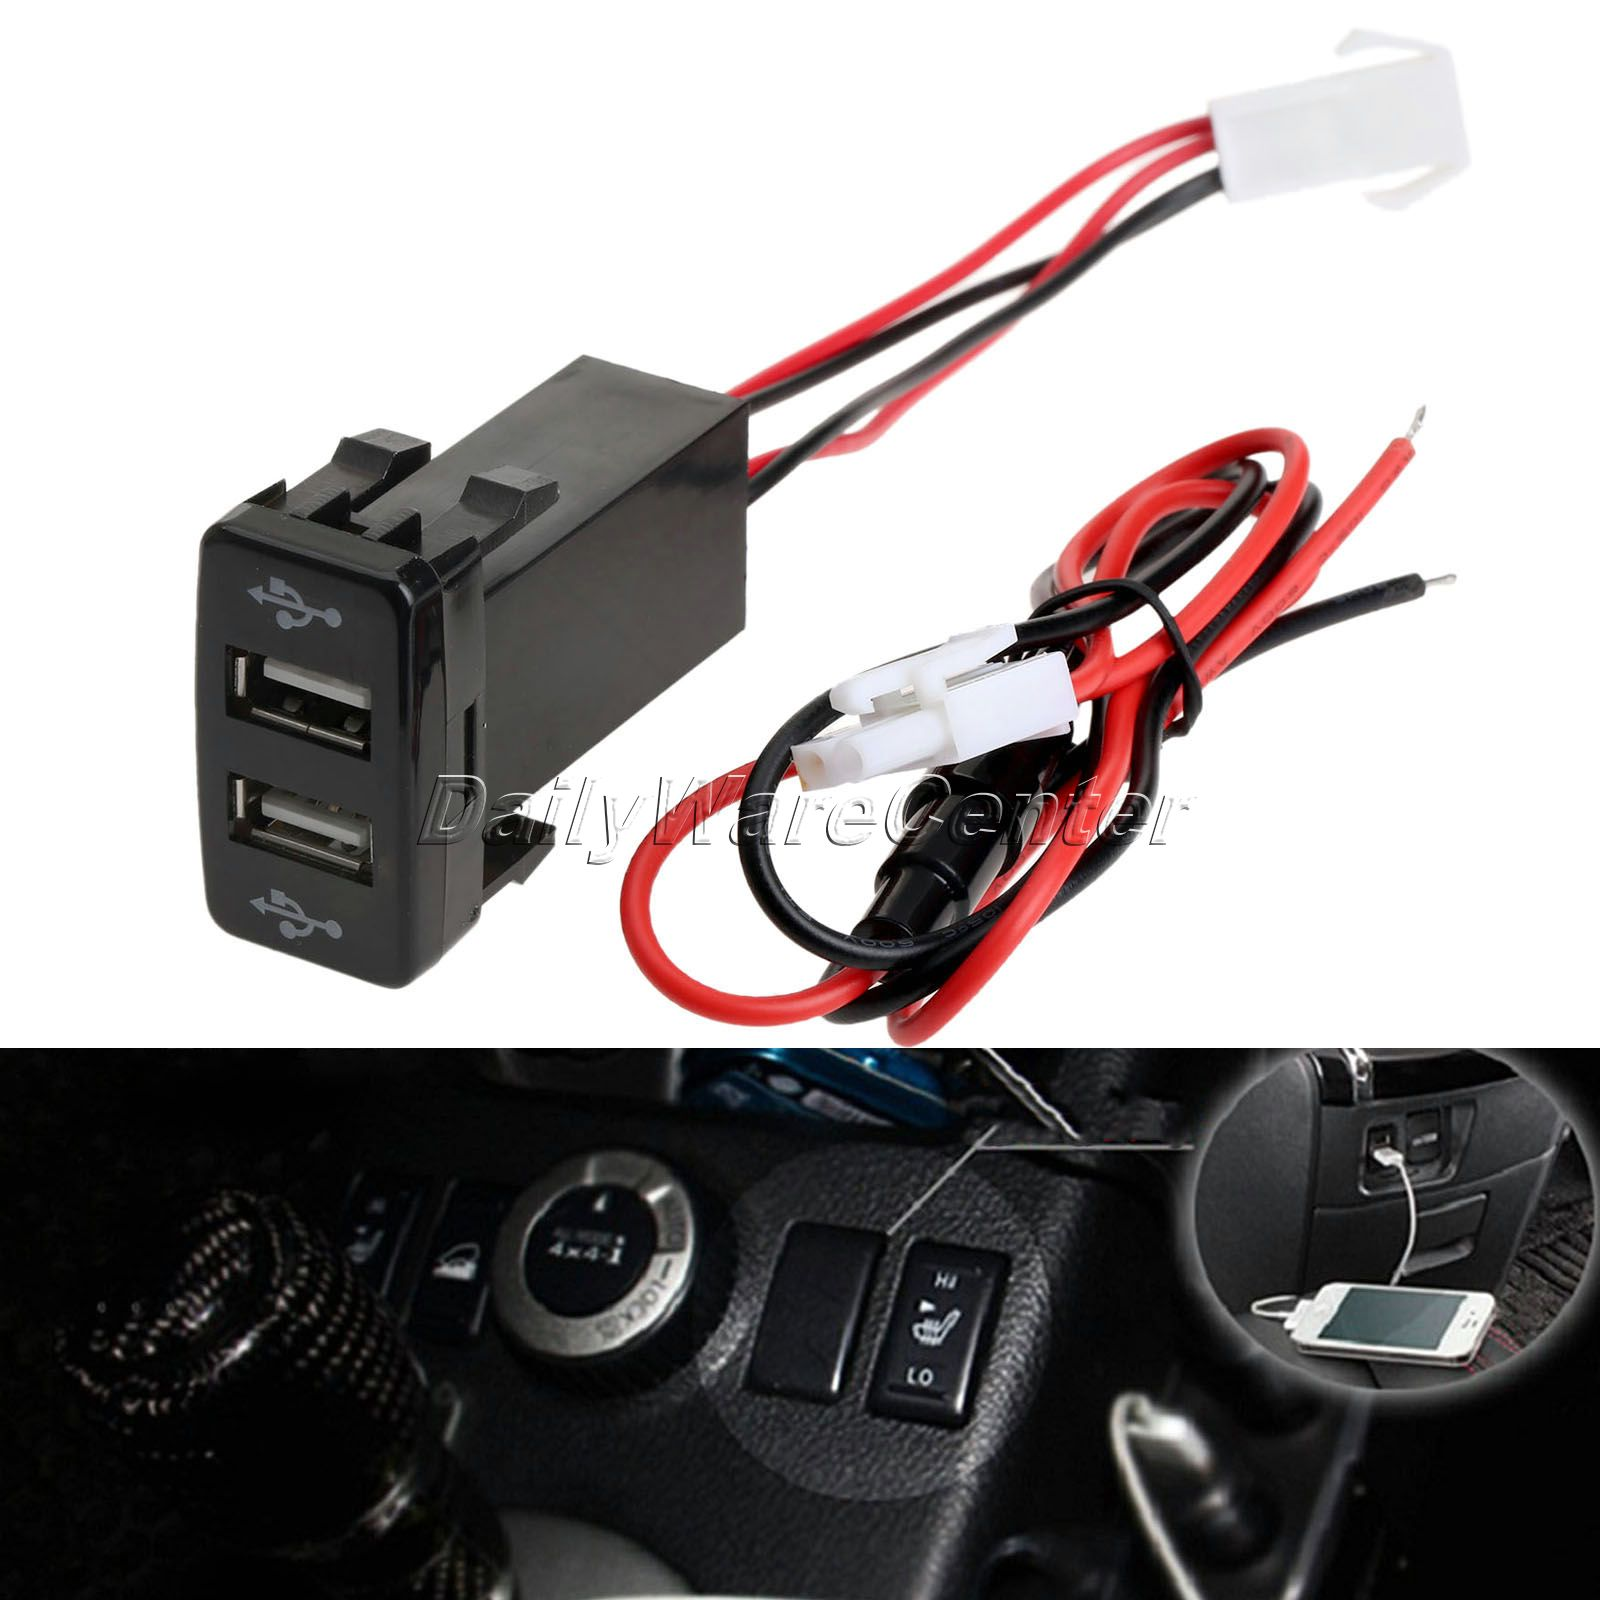 12 V 2.1A Del Coche Automático de Doble Puerto USB Adaptador de Cargador de PDA